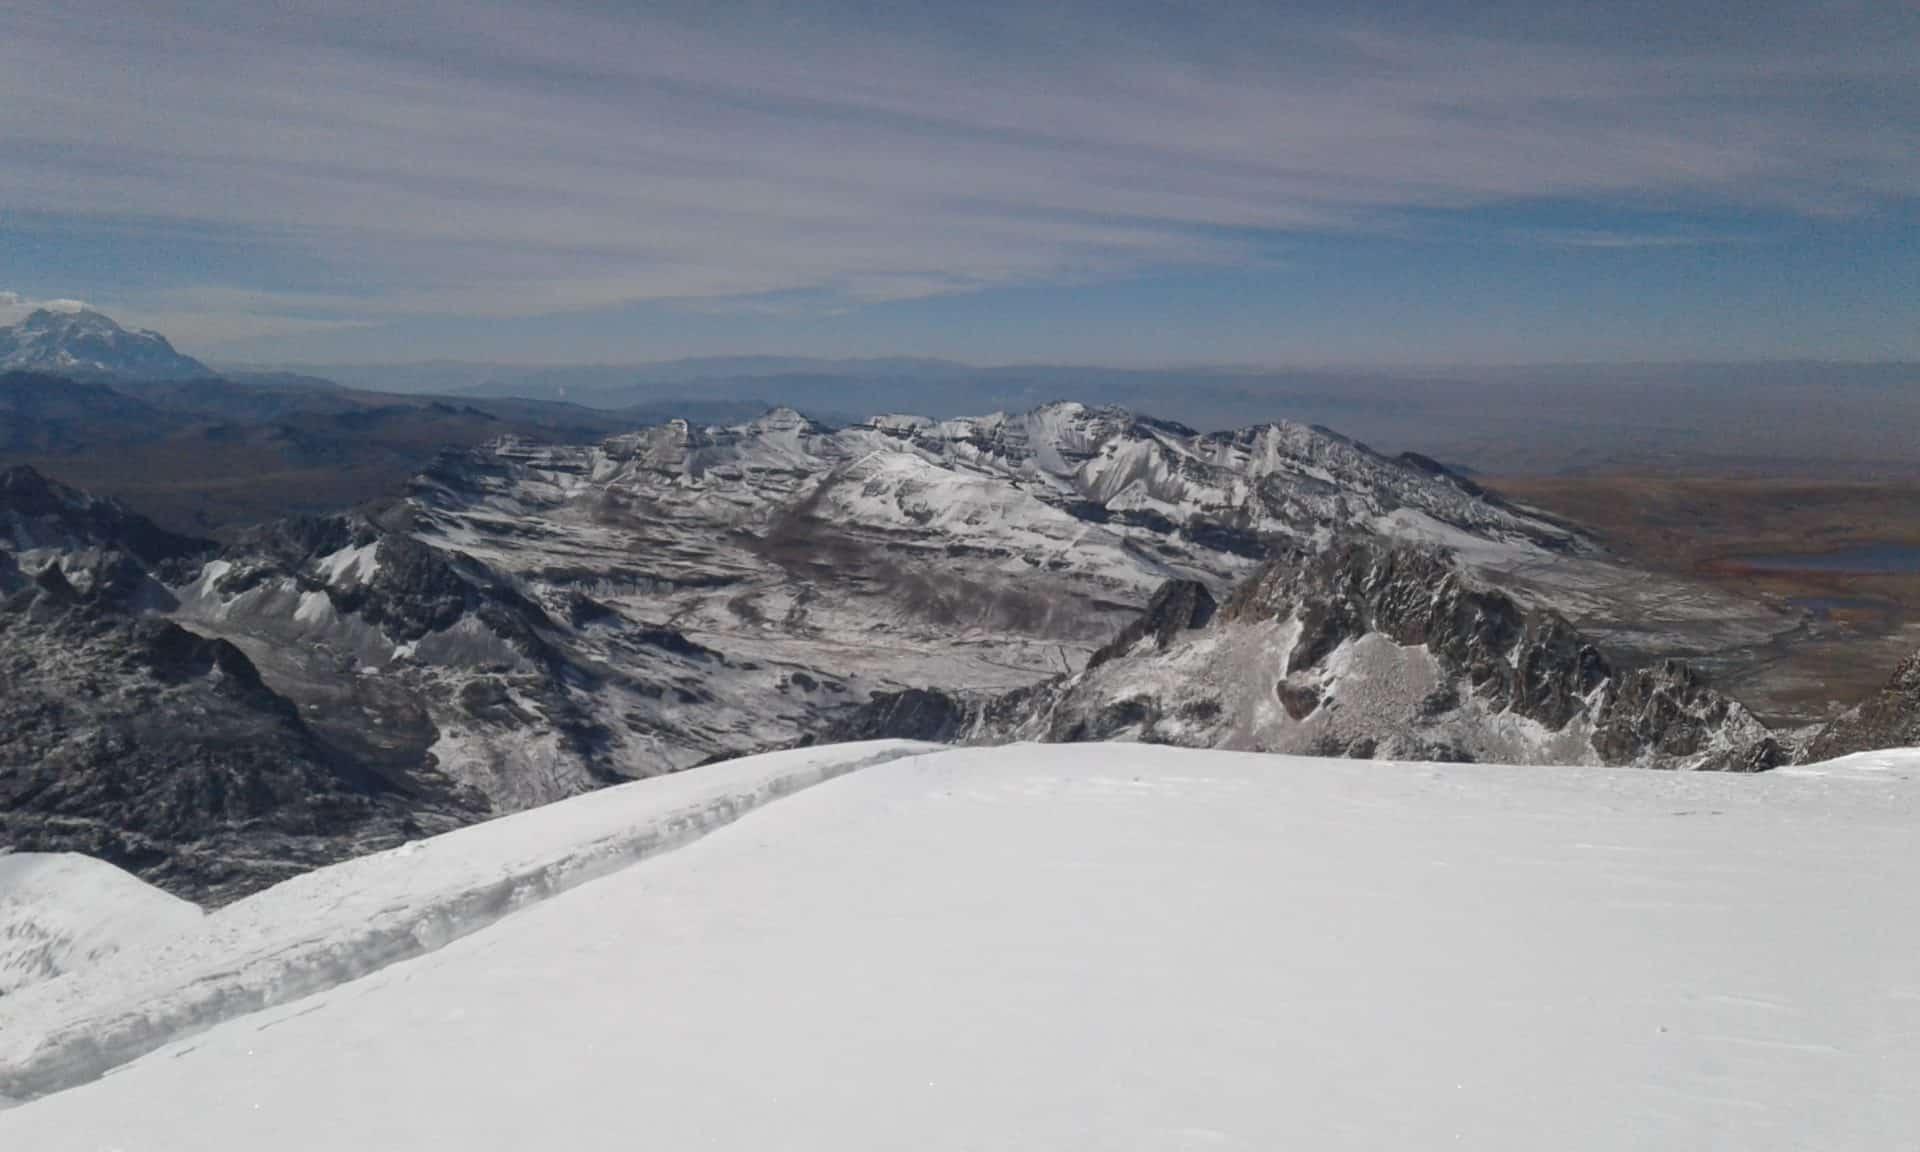 Nevado Sajama ascent (6542m), Bolivia